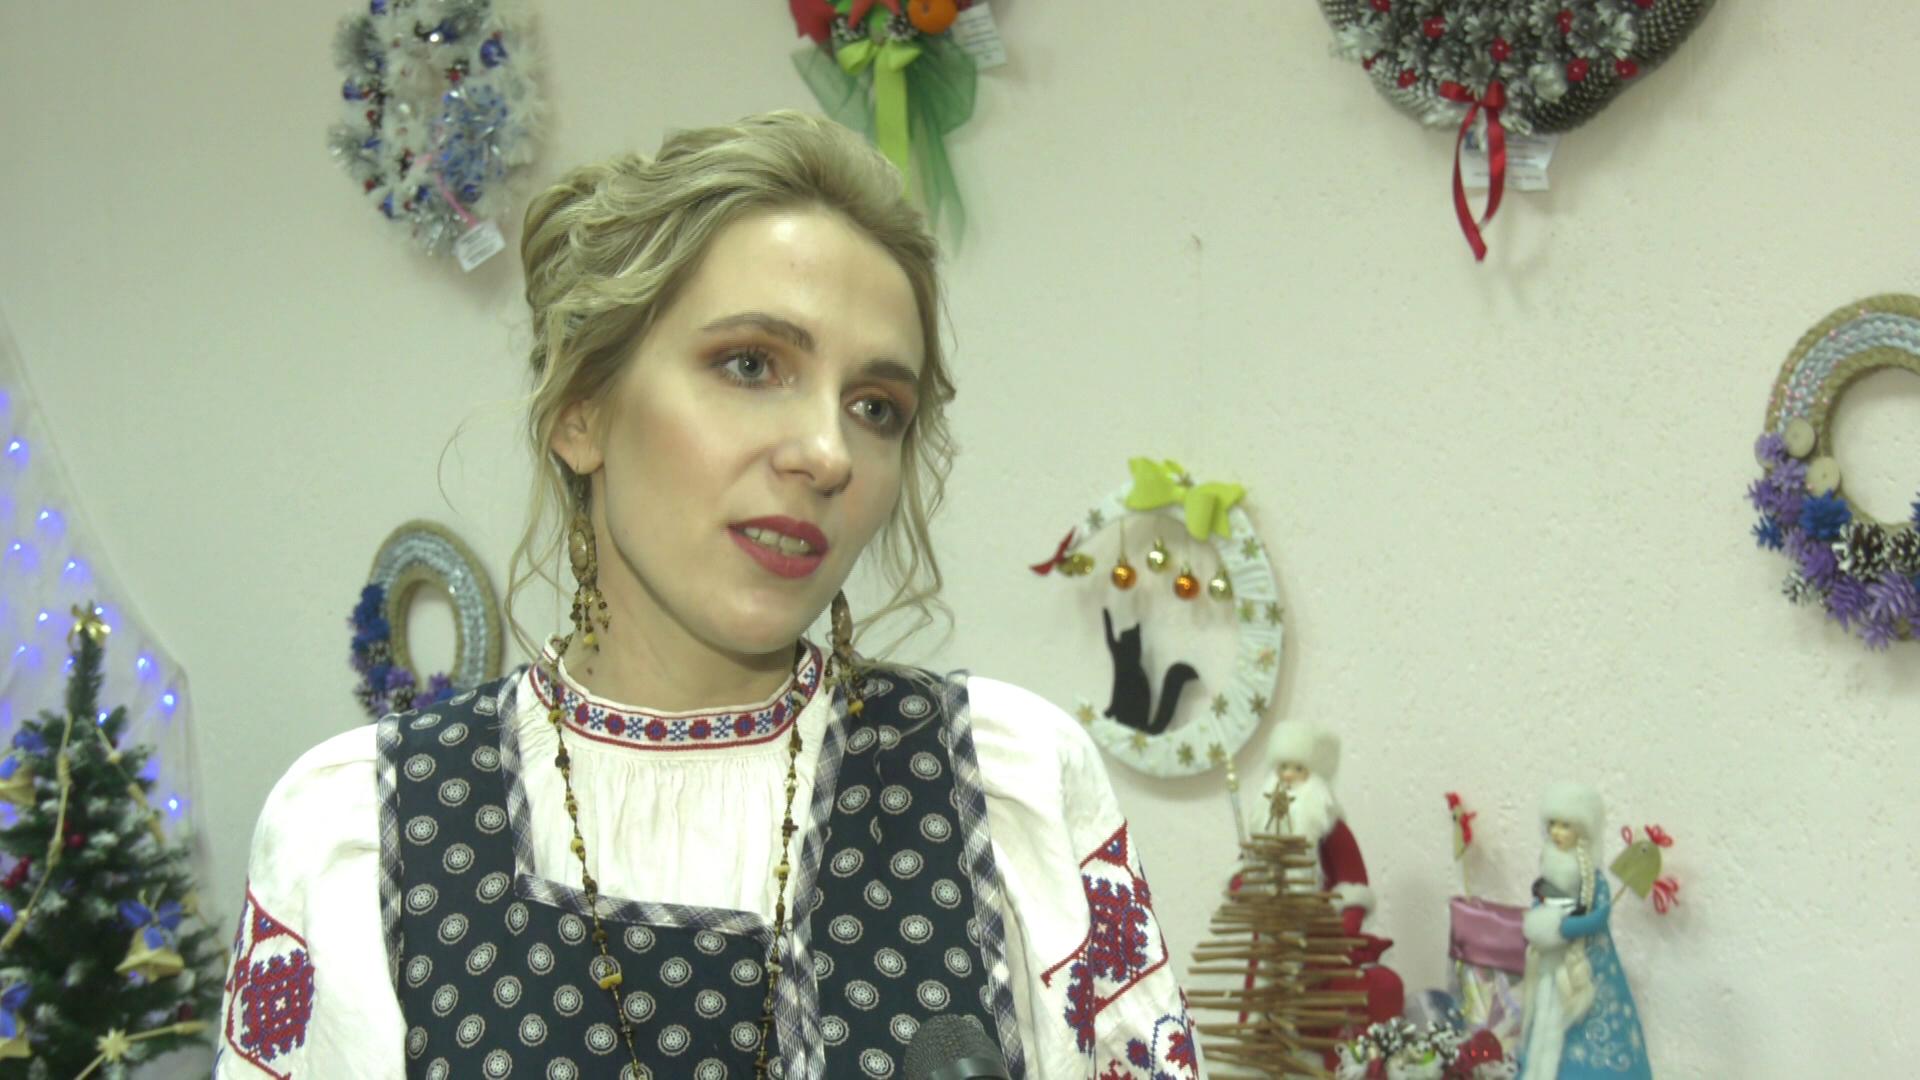 vytinanka - Выставка Анны Перлиной «Сонца праз фіранку» (видео)